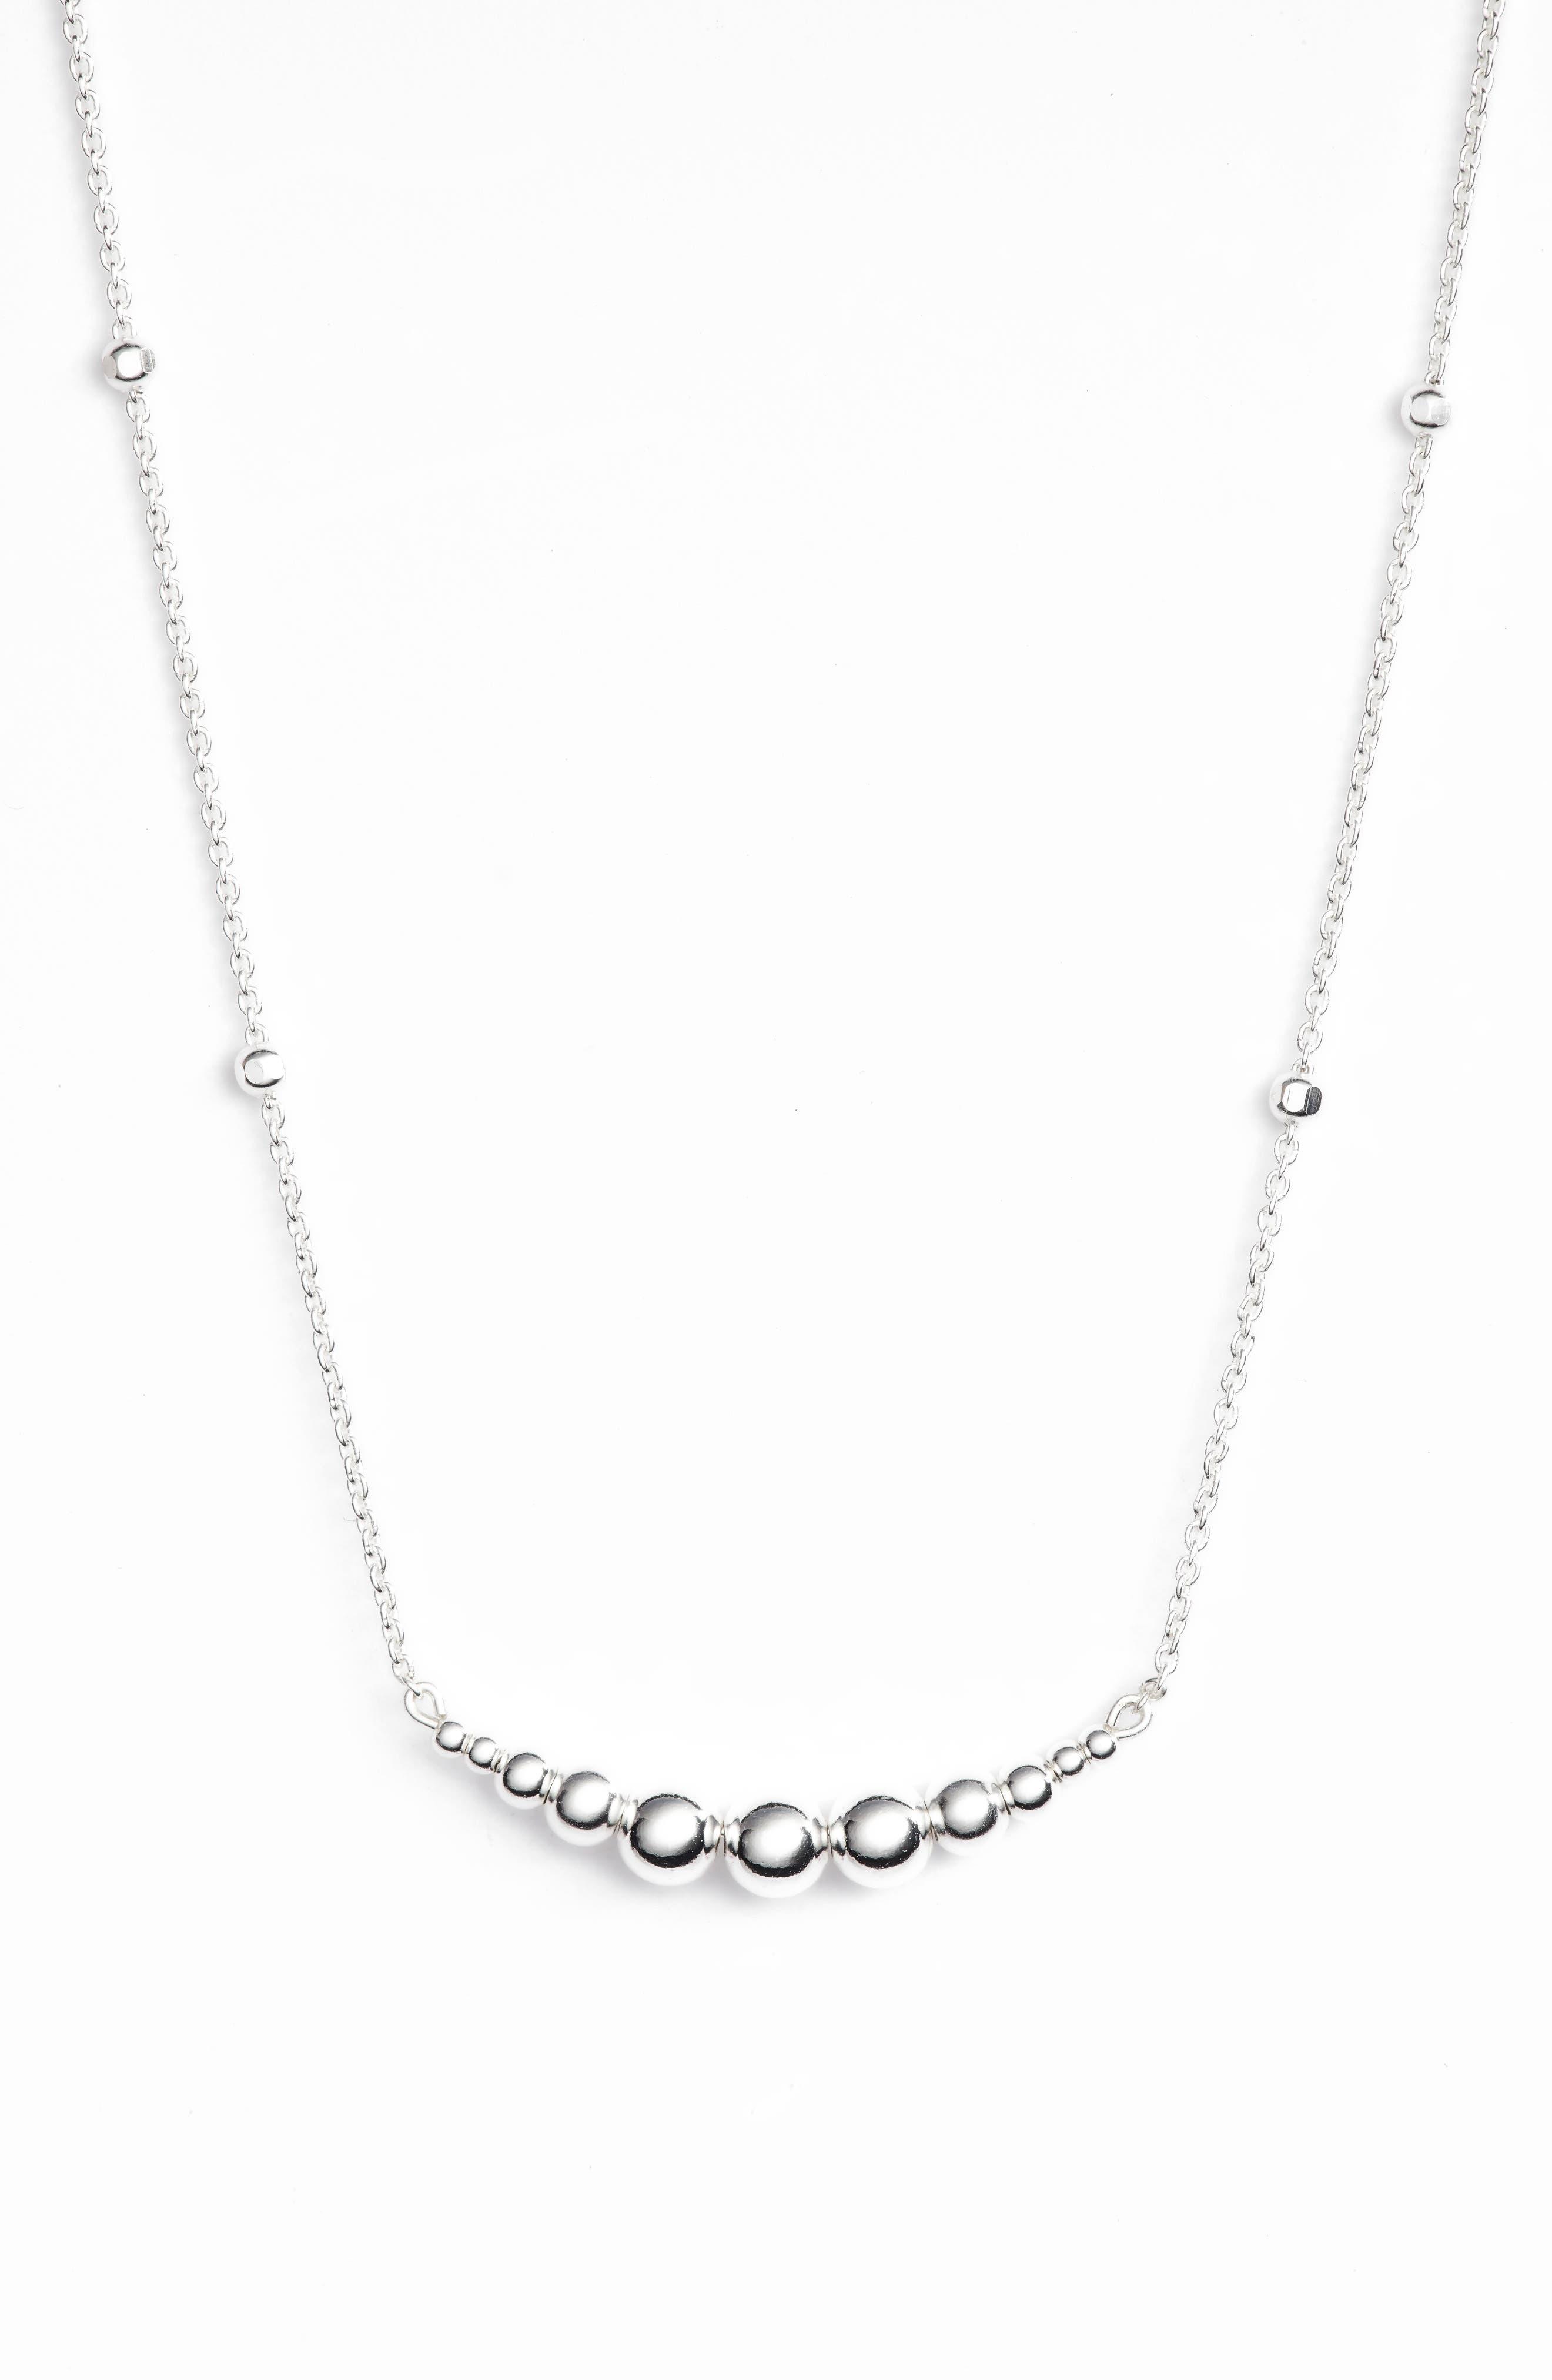 Graduated Sphere Pendant Necklace,                         Main,                         color, SILVER